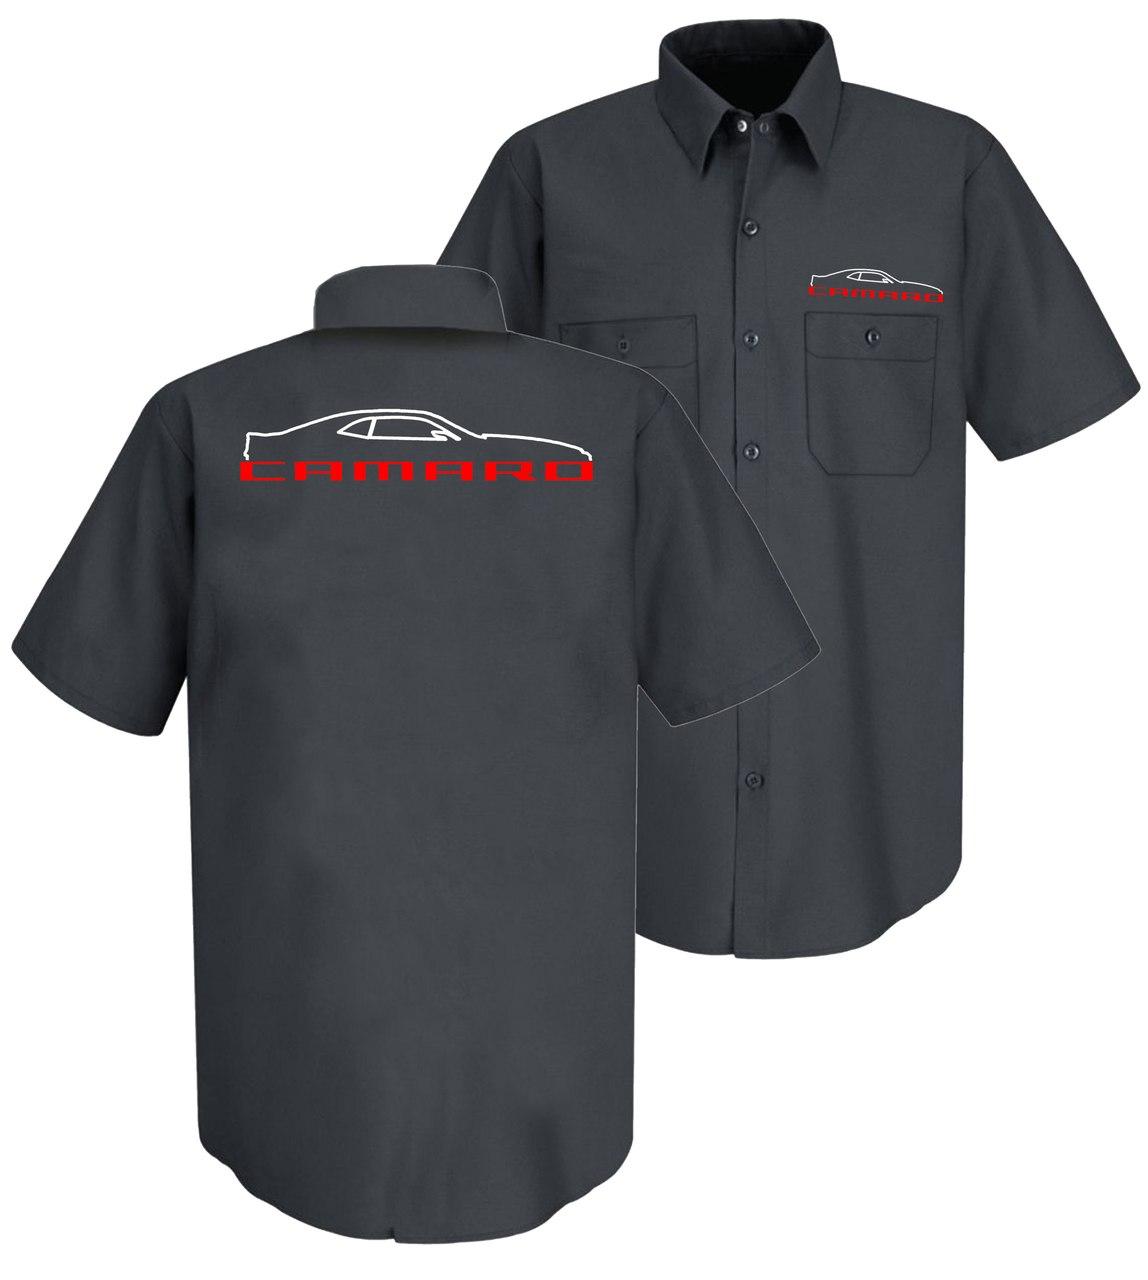 1148x1280 Ms101 5th Gen Camaro Silhouette Mechanic Shirt Small Thru Xl